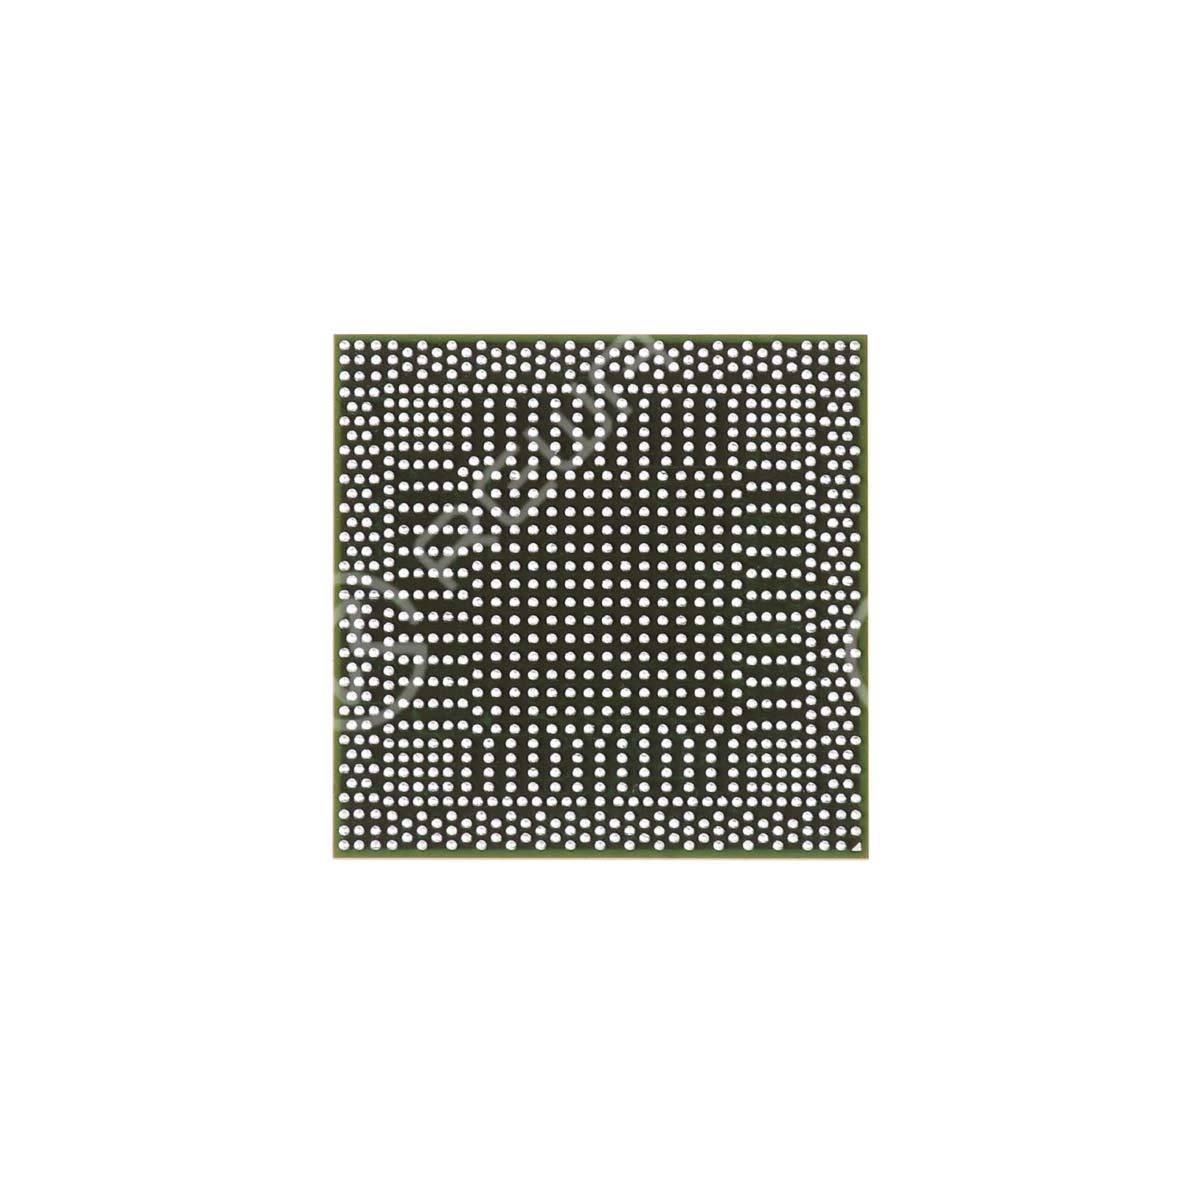 AMD GPU Graphic Chipset 216-0810001 HD 6770M 512MB